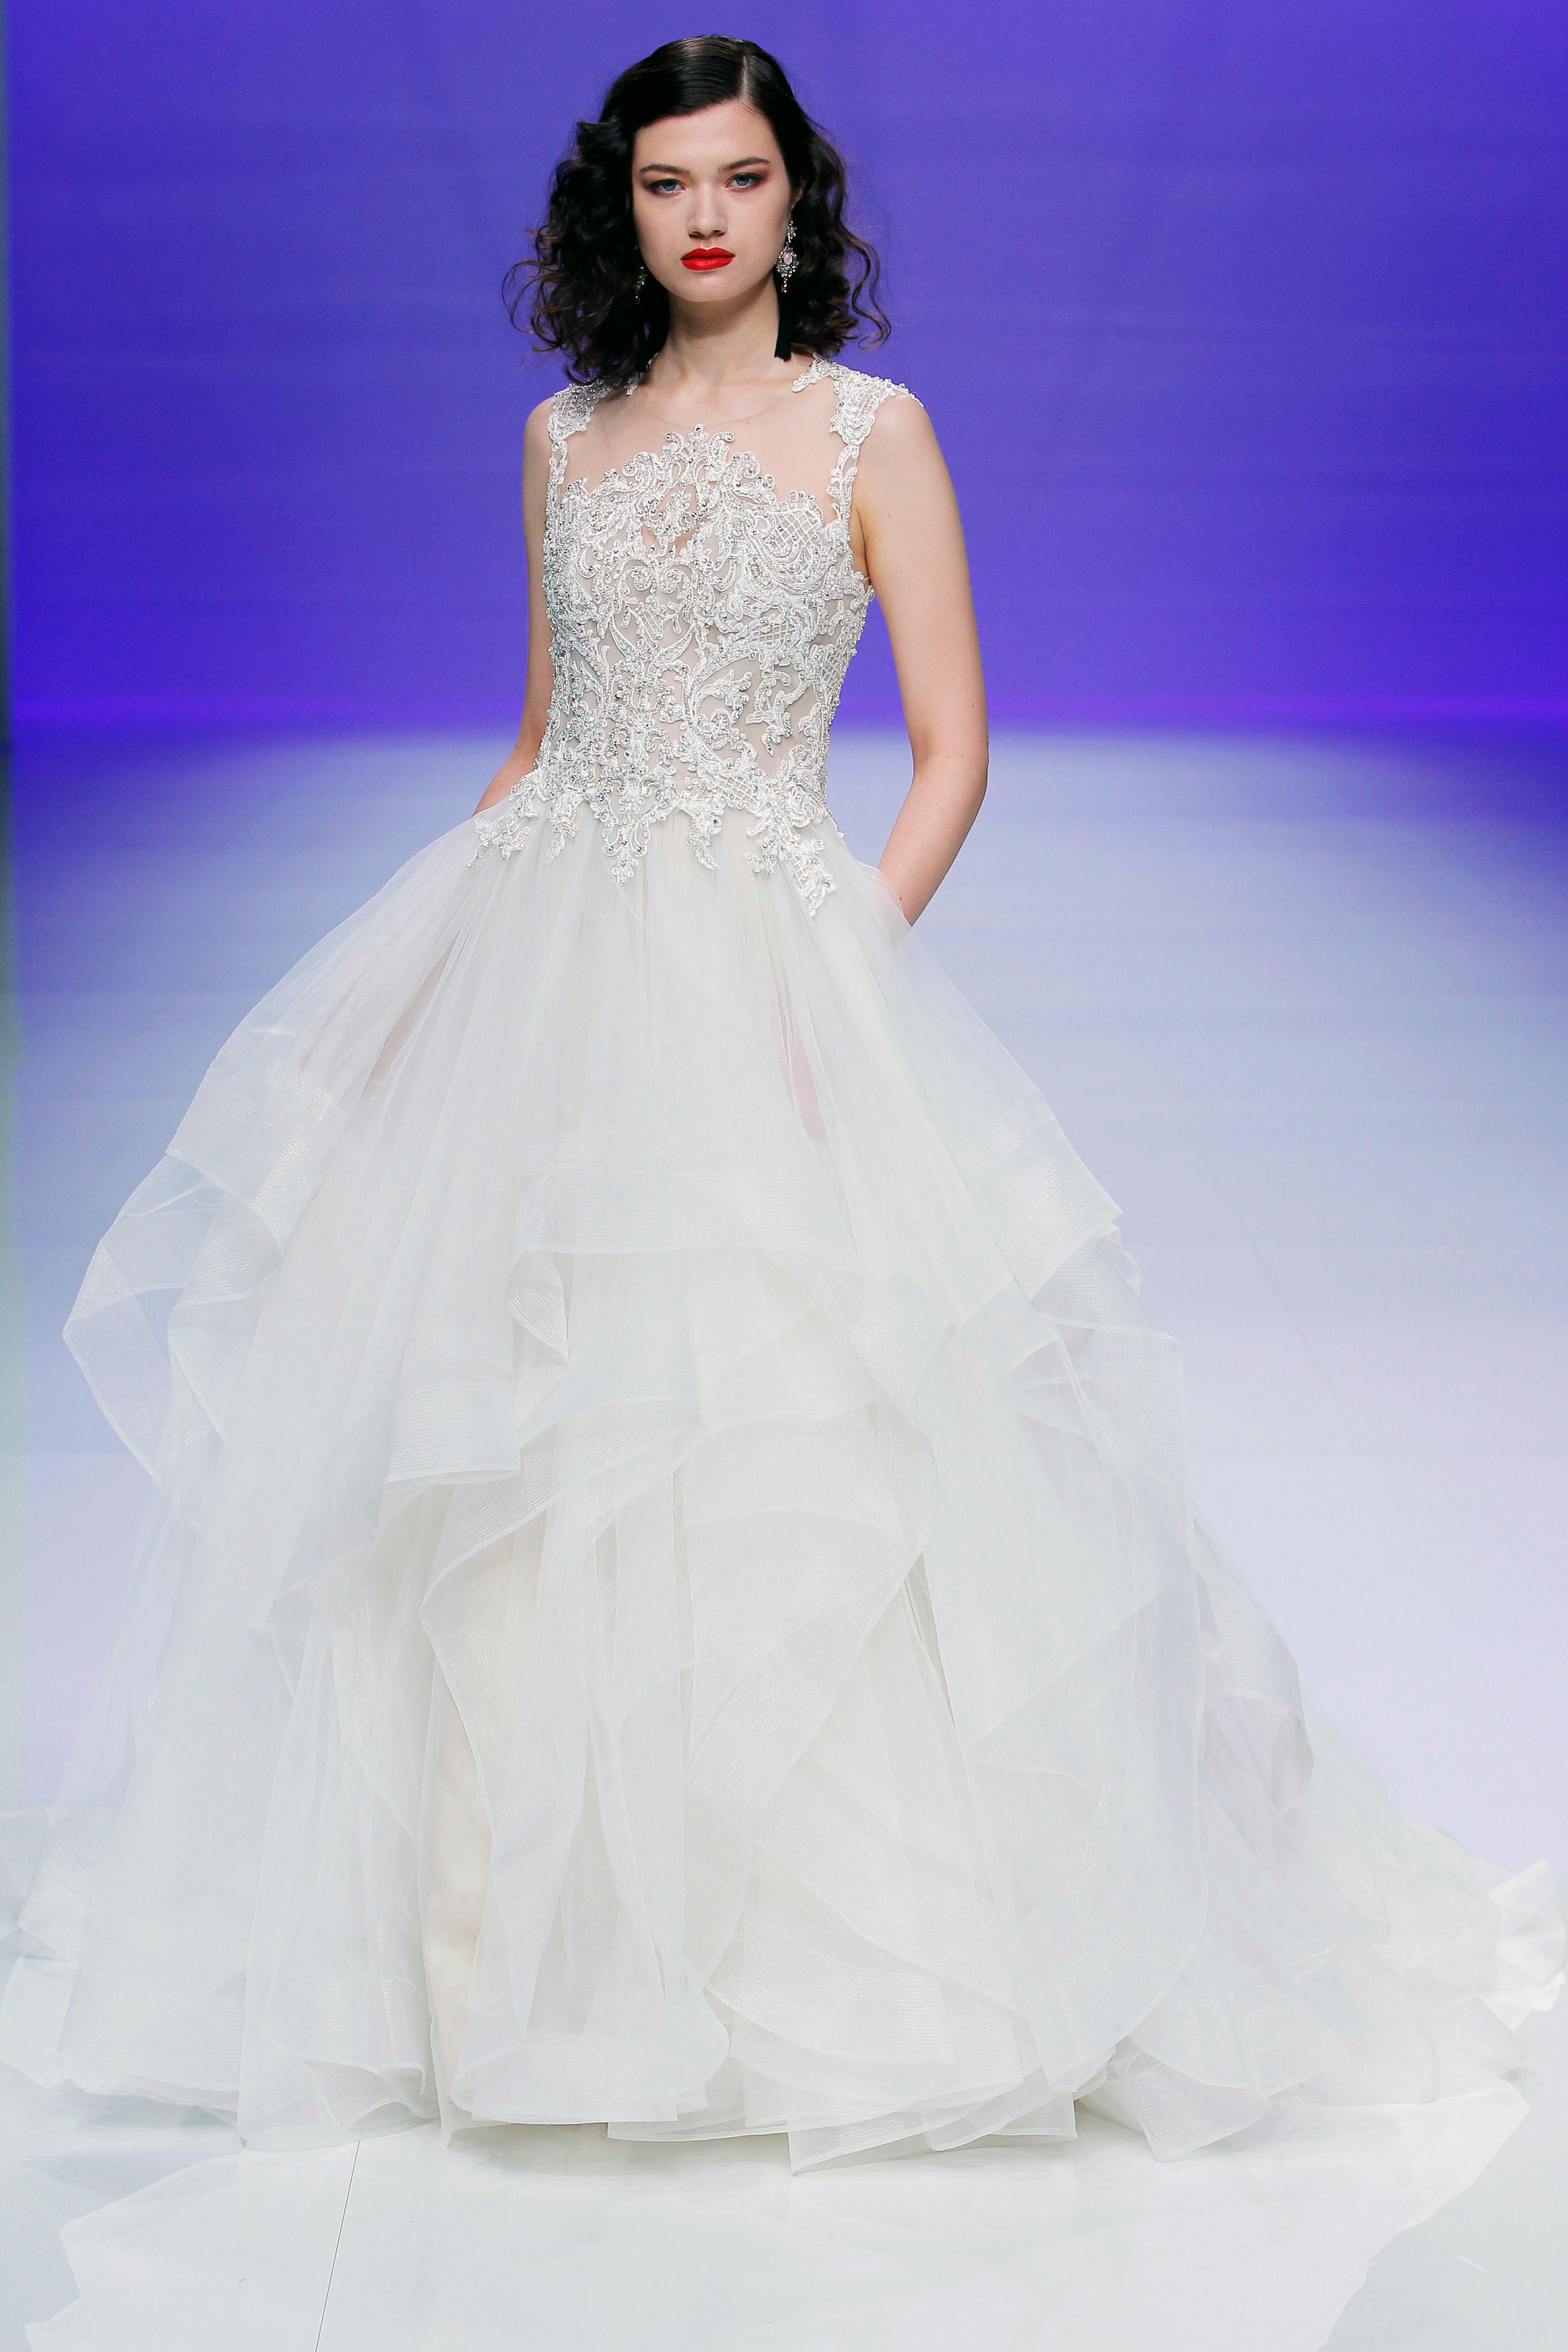 sottero midgley dress spring 2019 ruffles sleeveless a-line